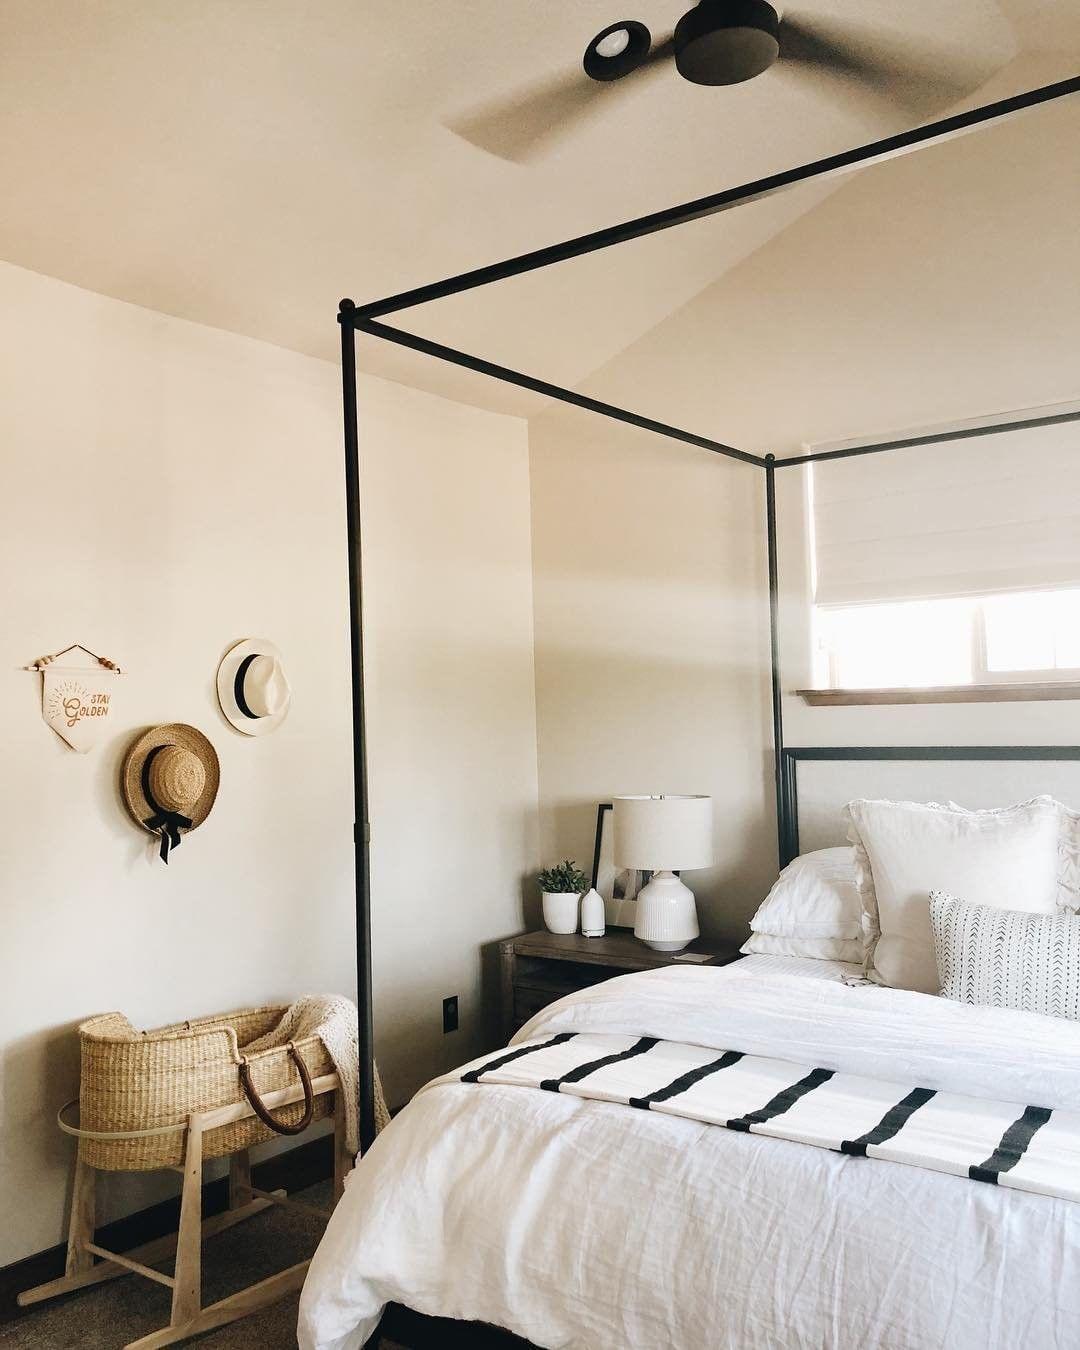 Linen Venice Set Bed Linens Luxury Guest Room Bed Black Canopy